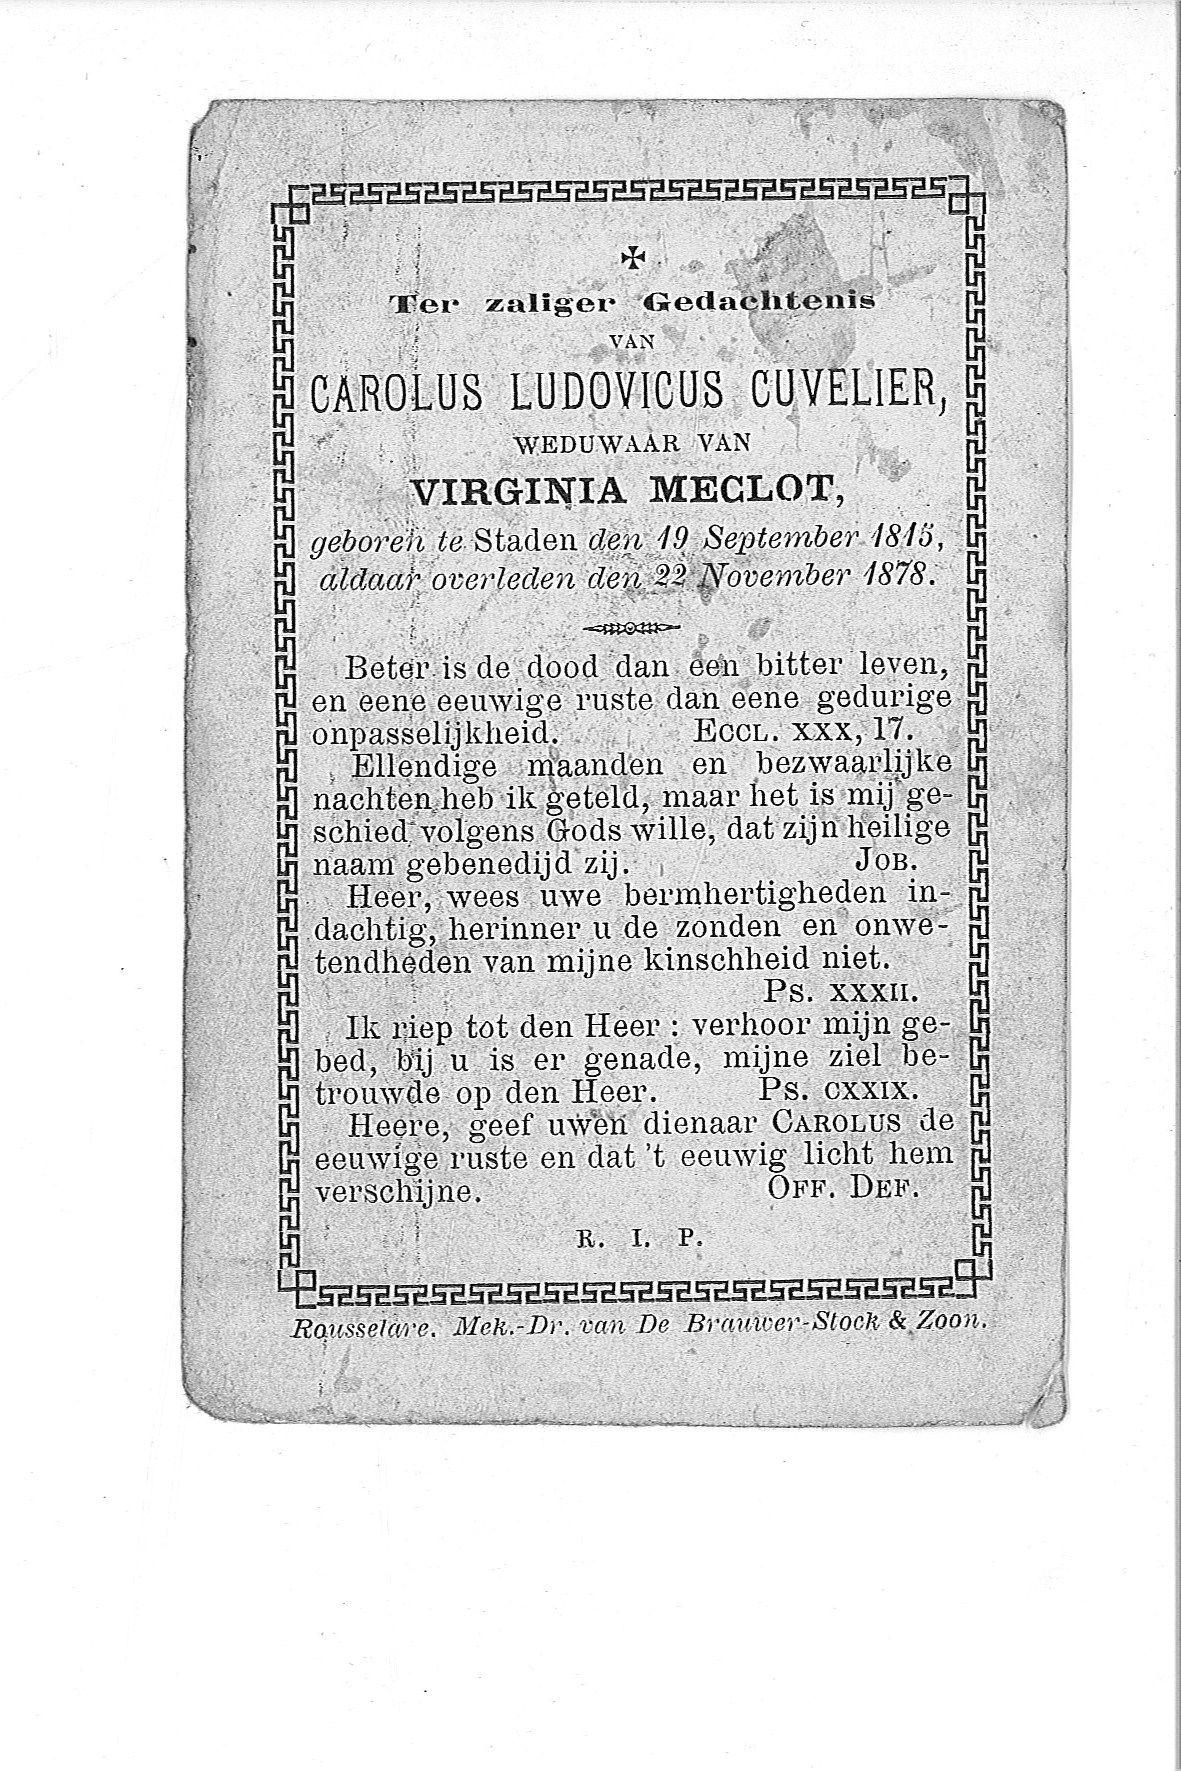 carolus-ludovicus(1878)20090323113315_00021.jpg